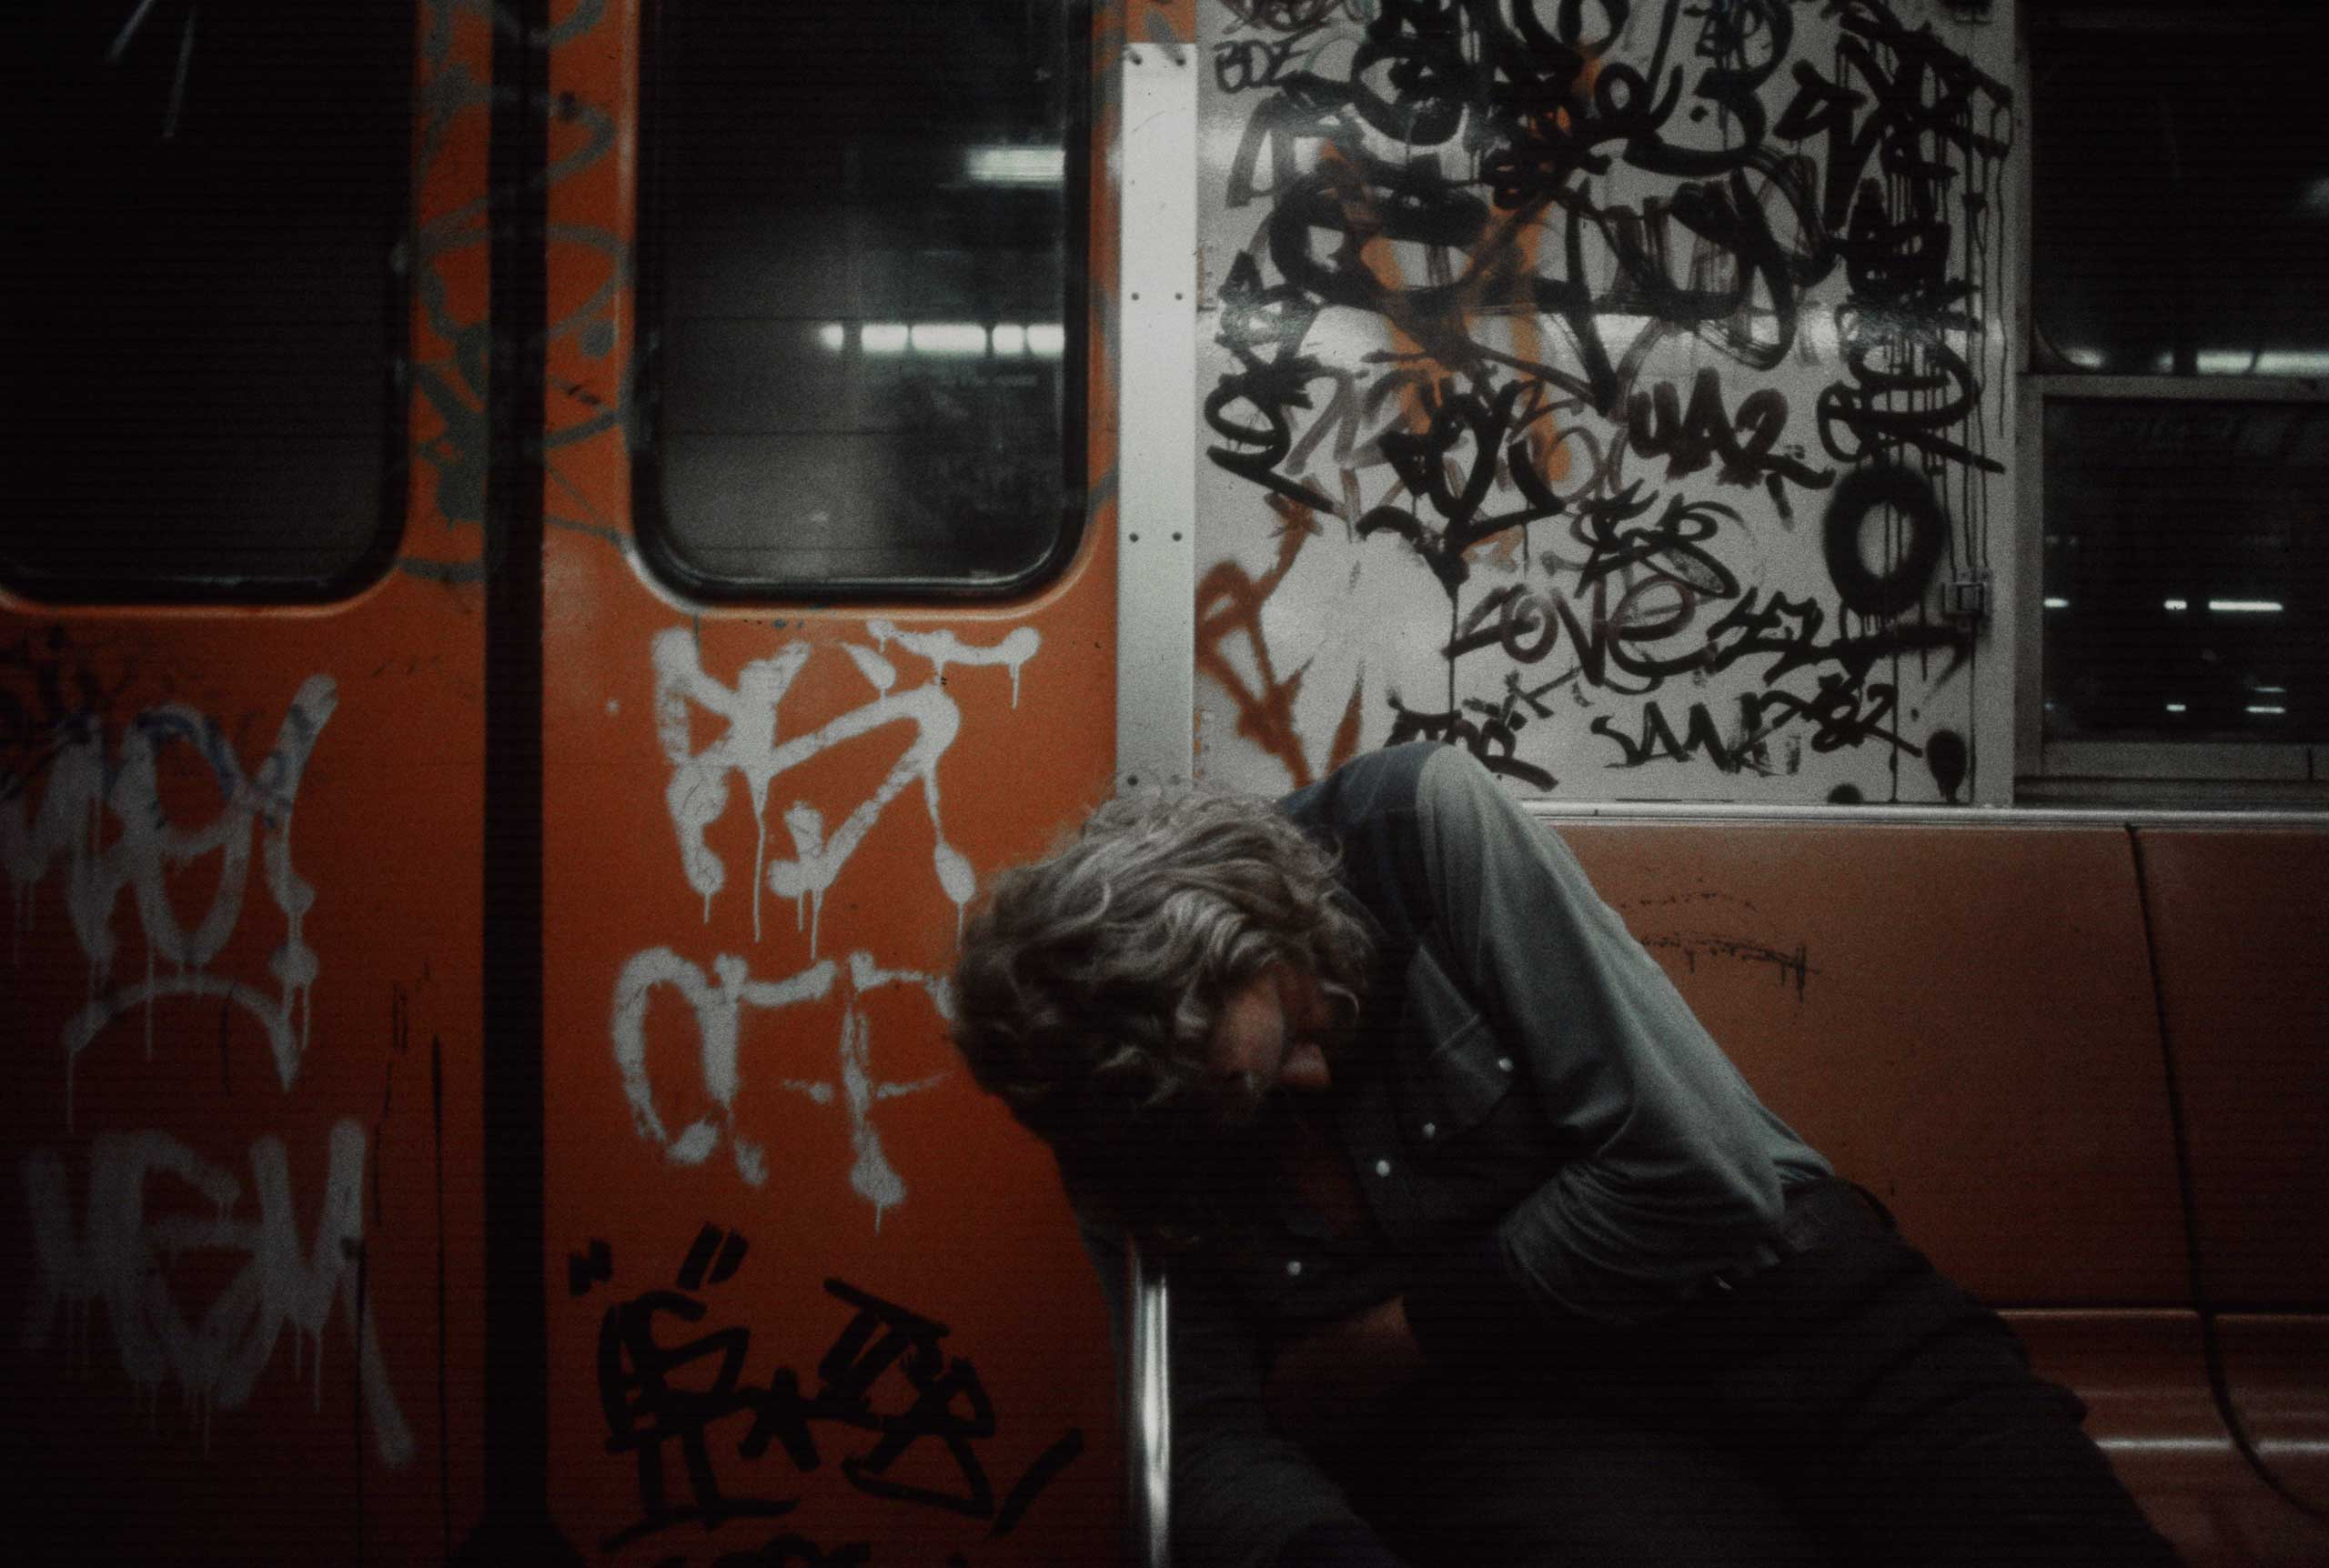 A man sleeps in a subway car, 1981.